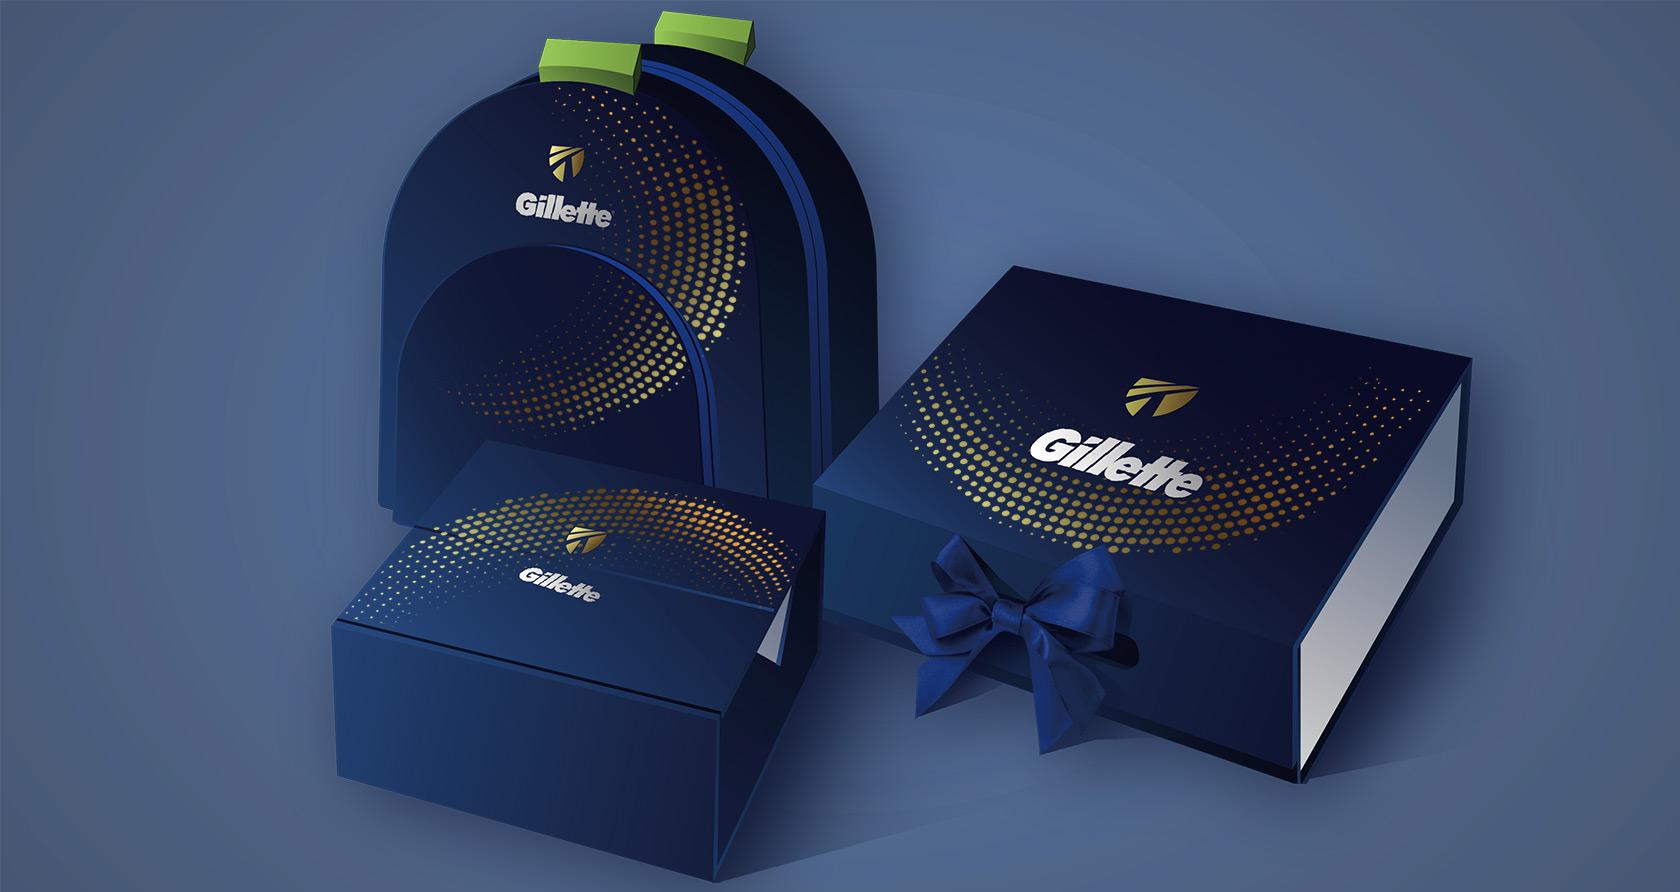 Gillette Christmas gift box(2020)